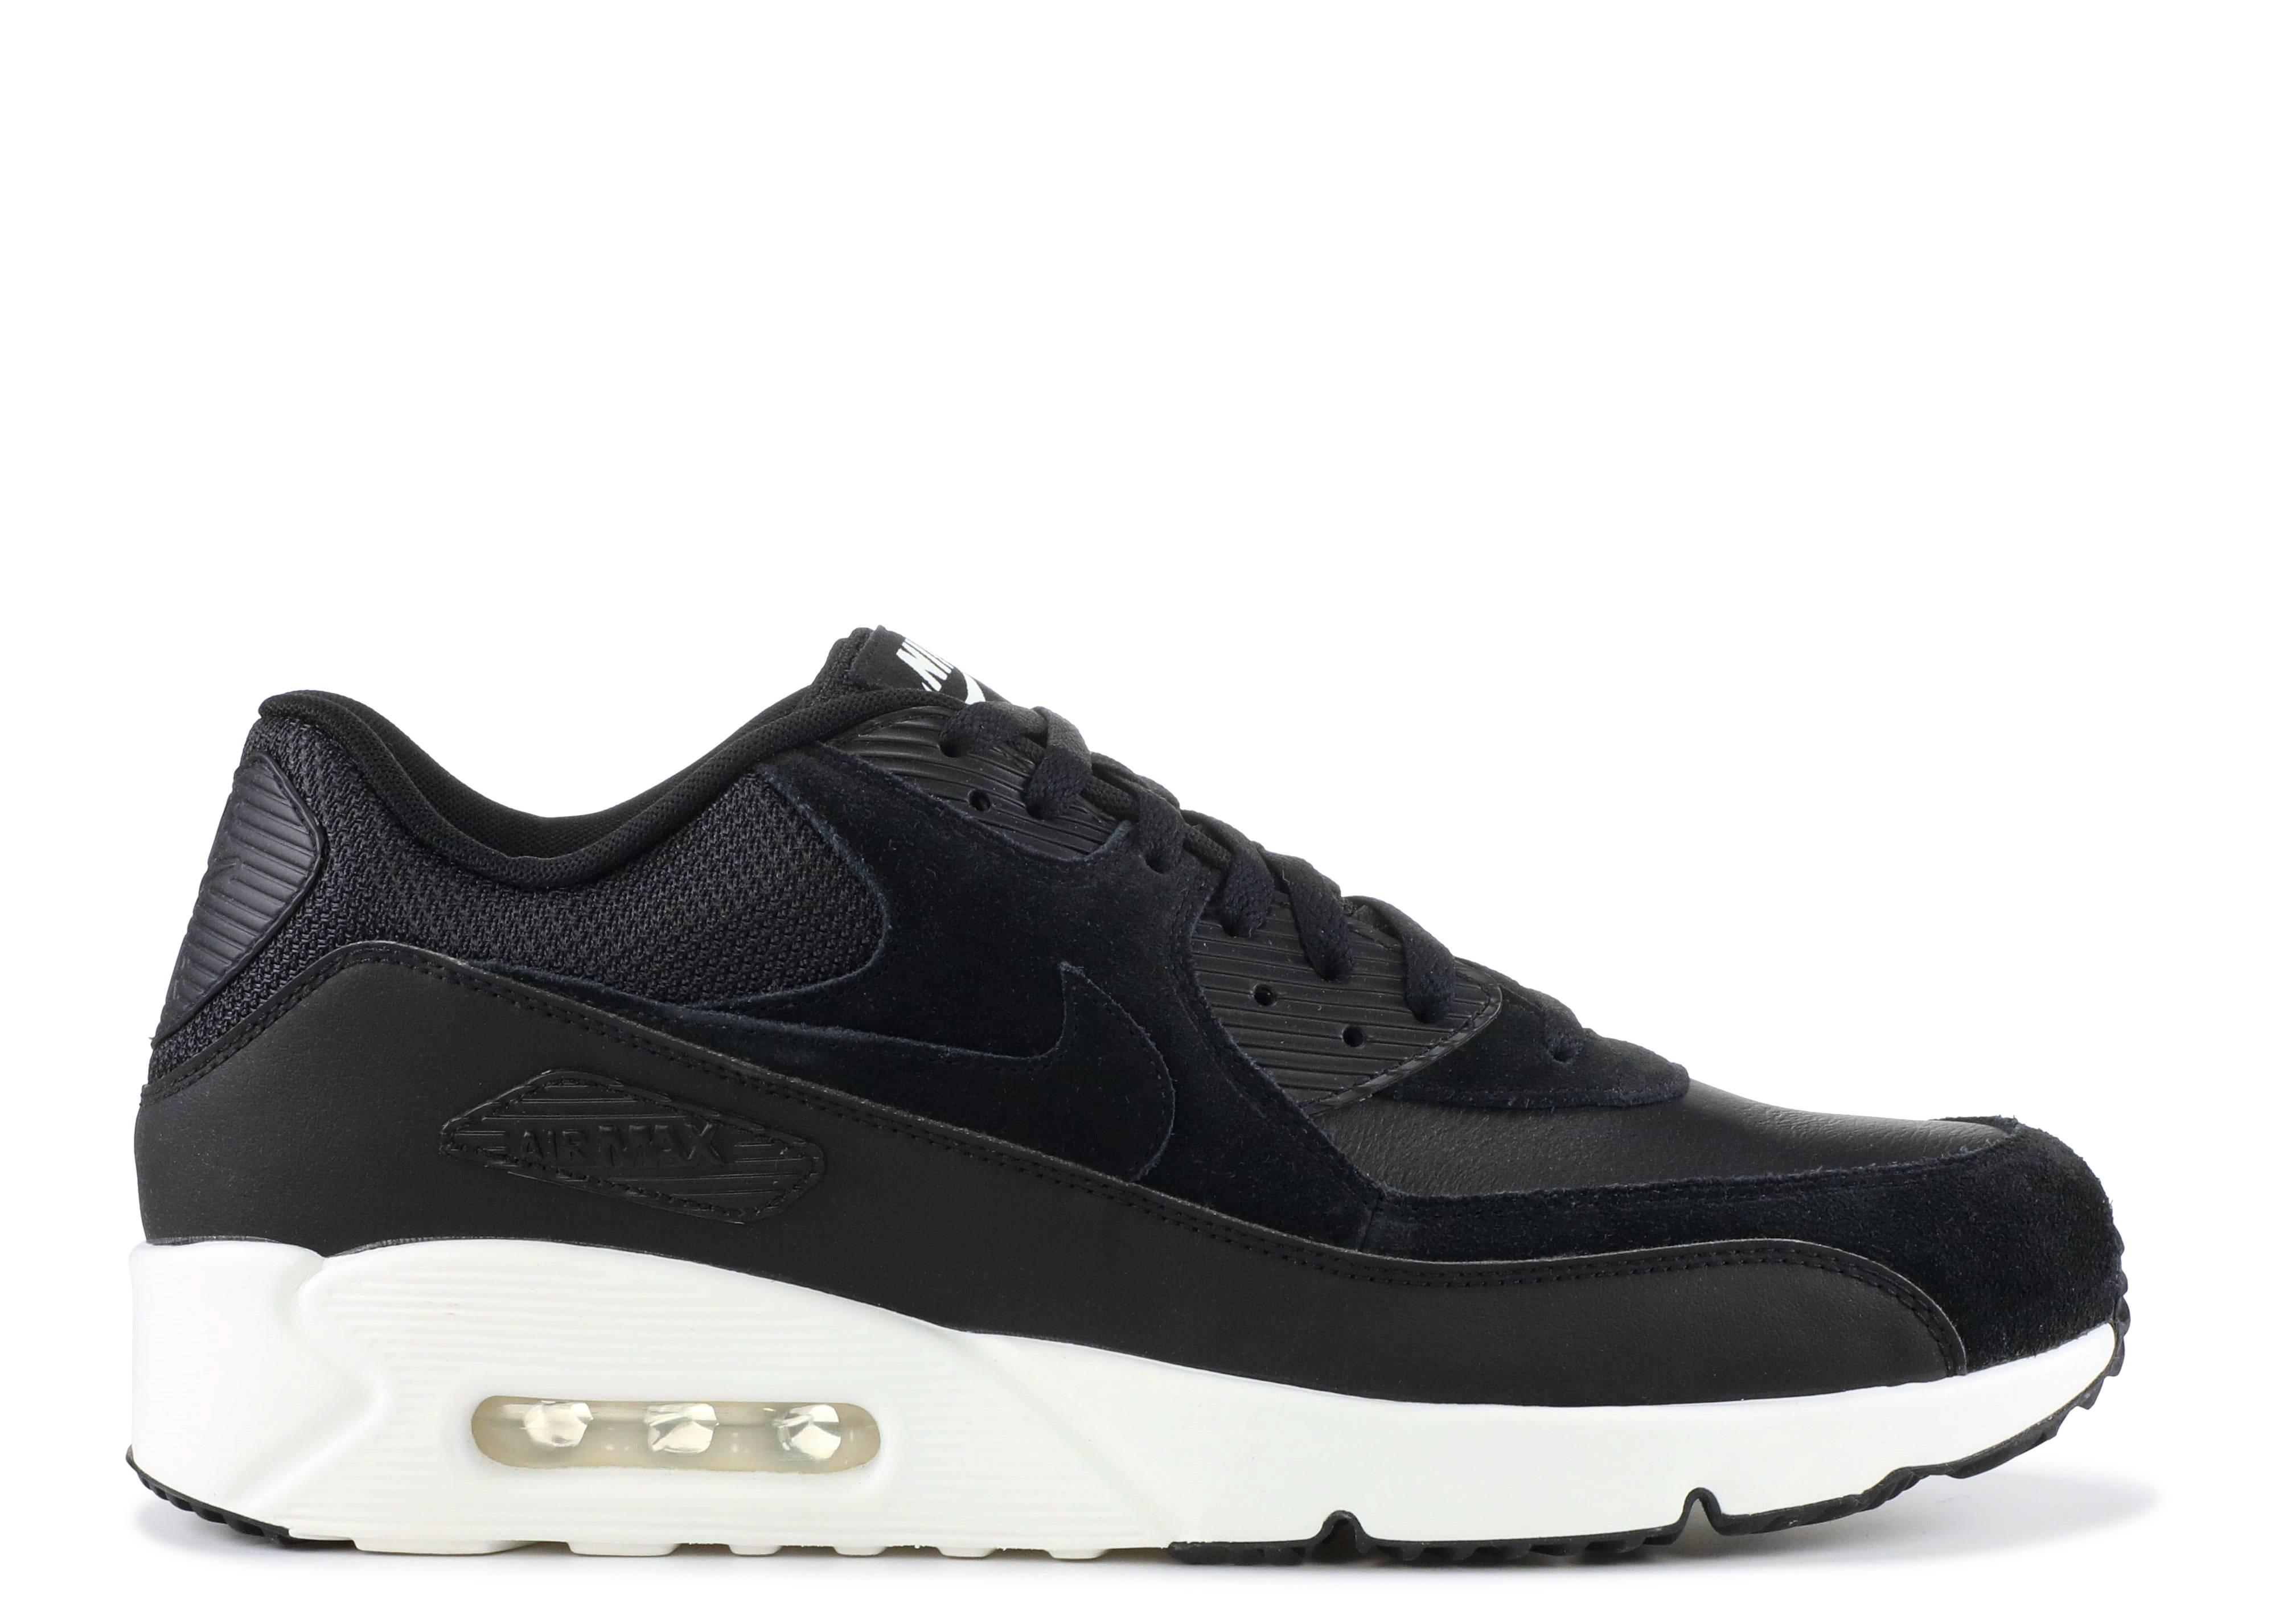 best sneakers b6021 abc09 Air Max 90 Ultra 2.0 LTR